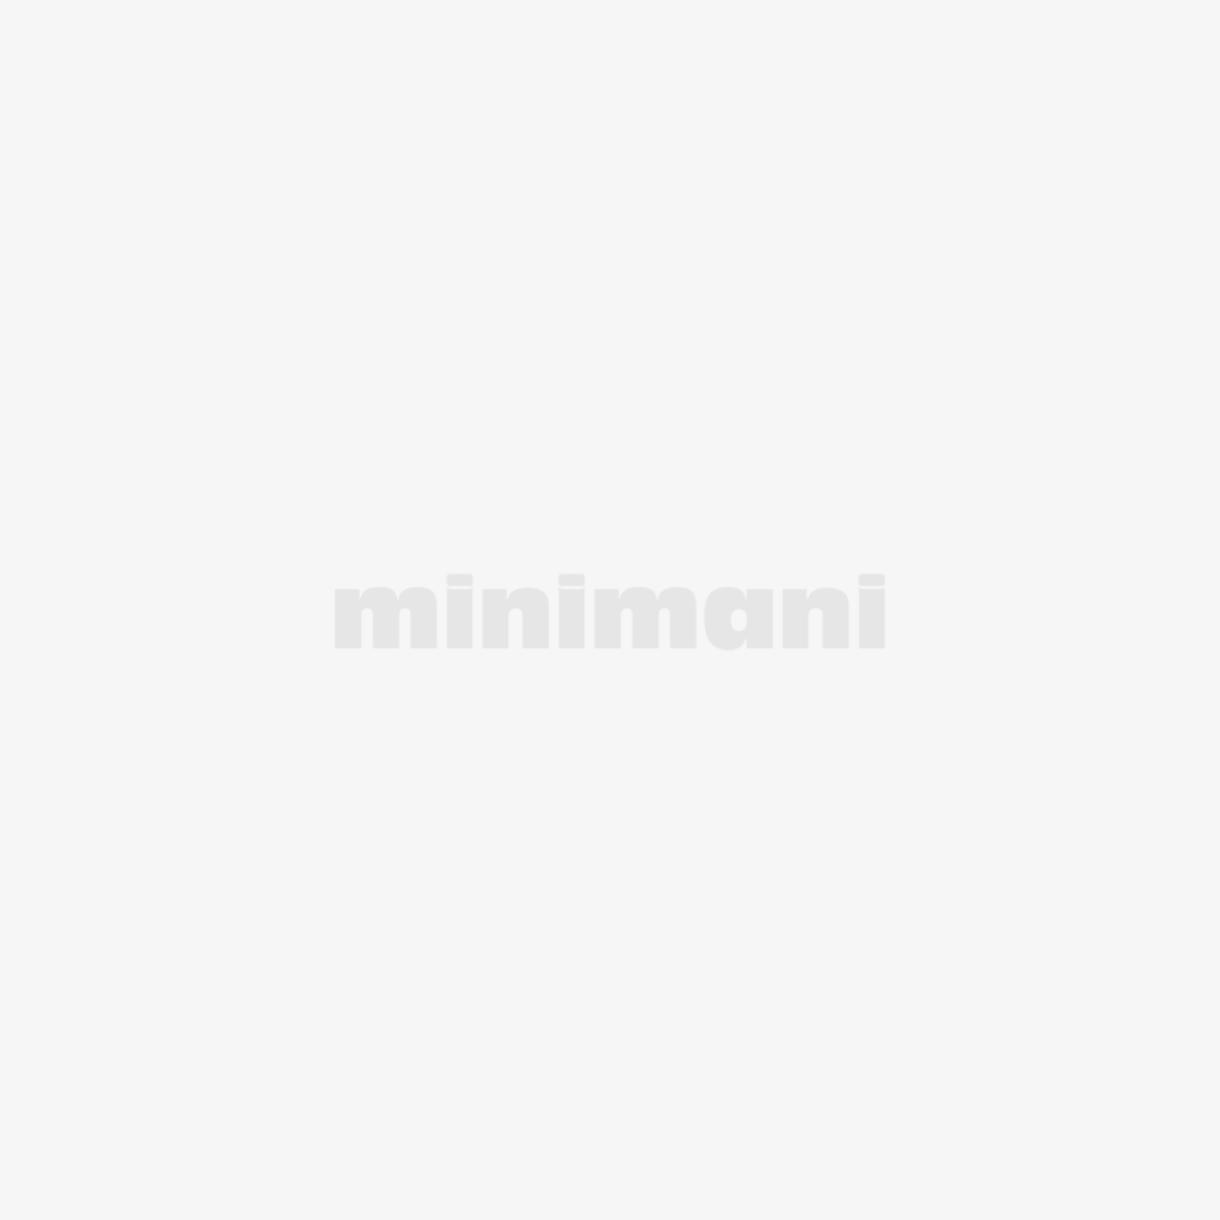 PrimaCat Premium Silica hiekka 3,8L